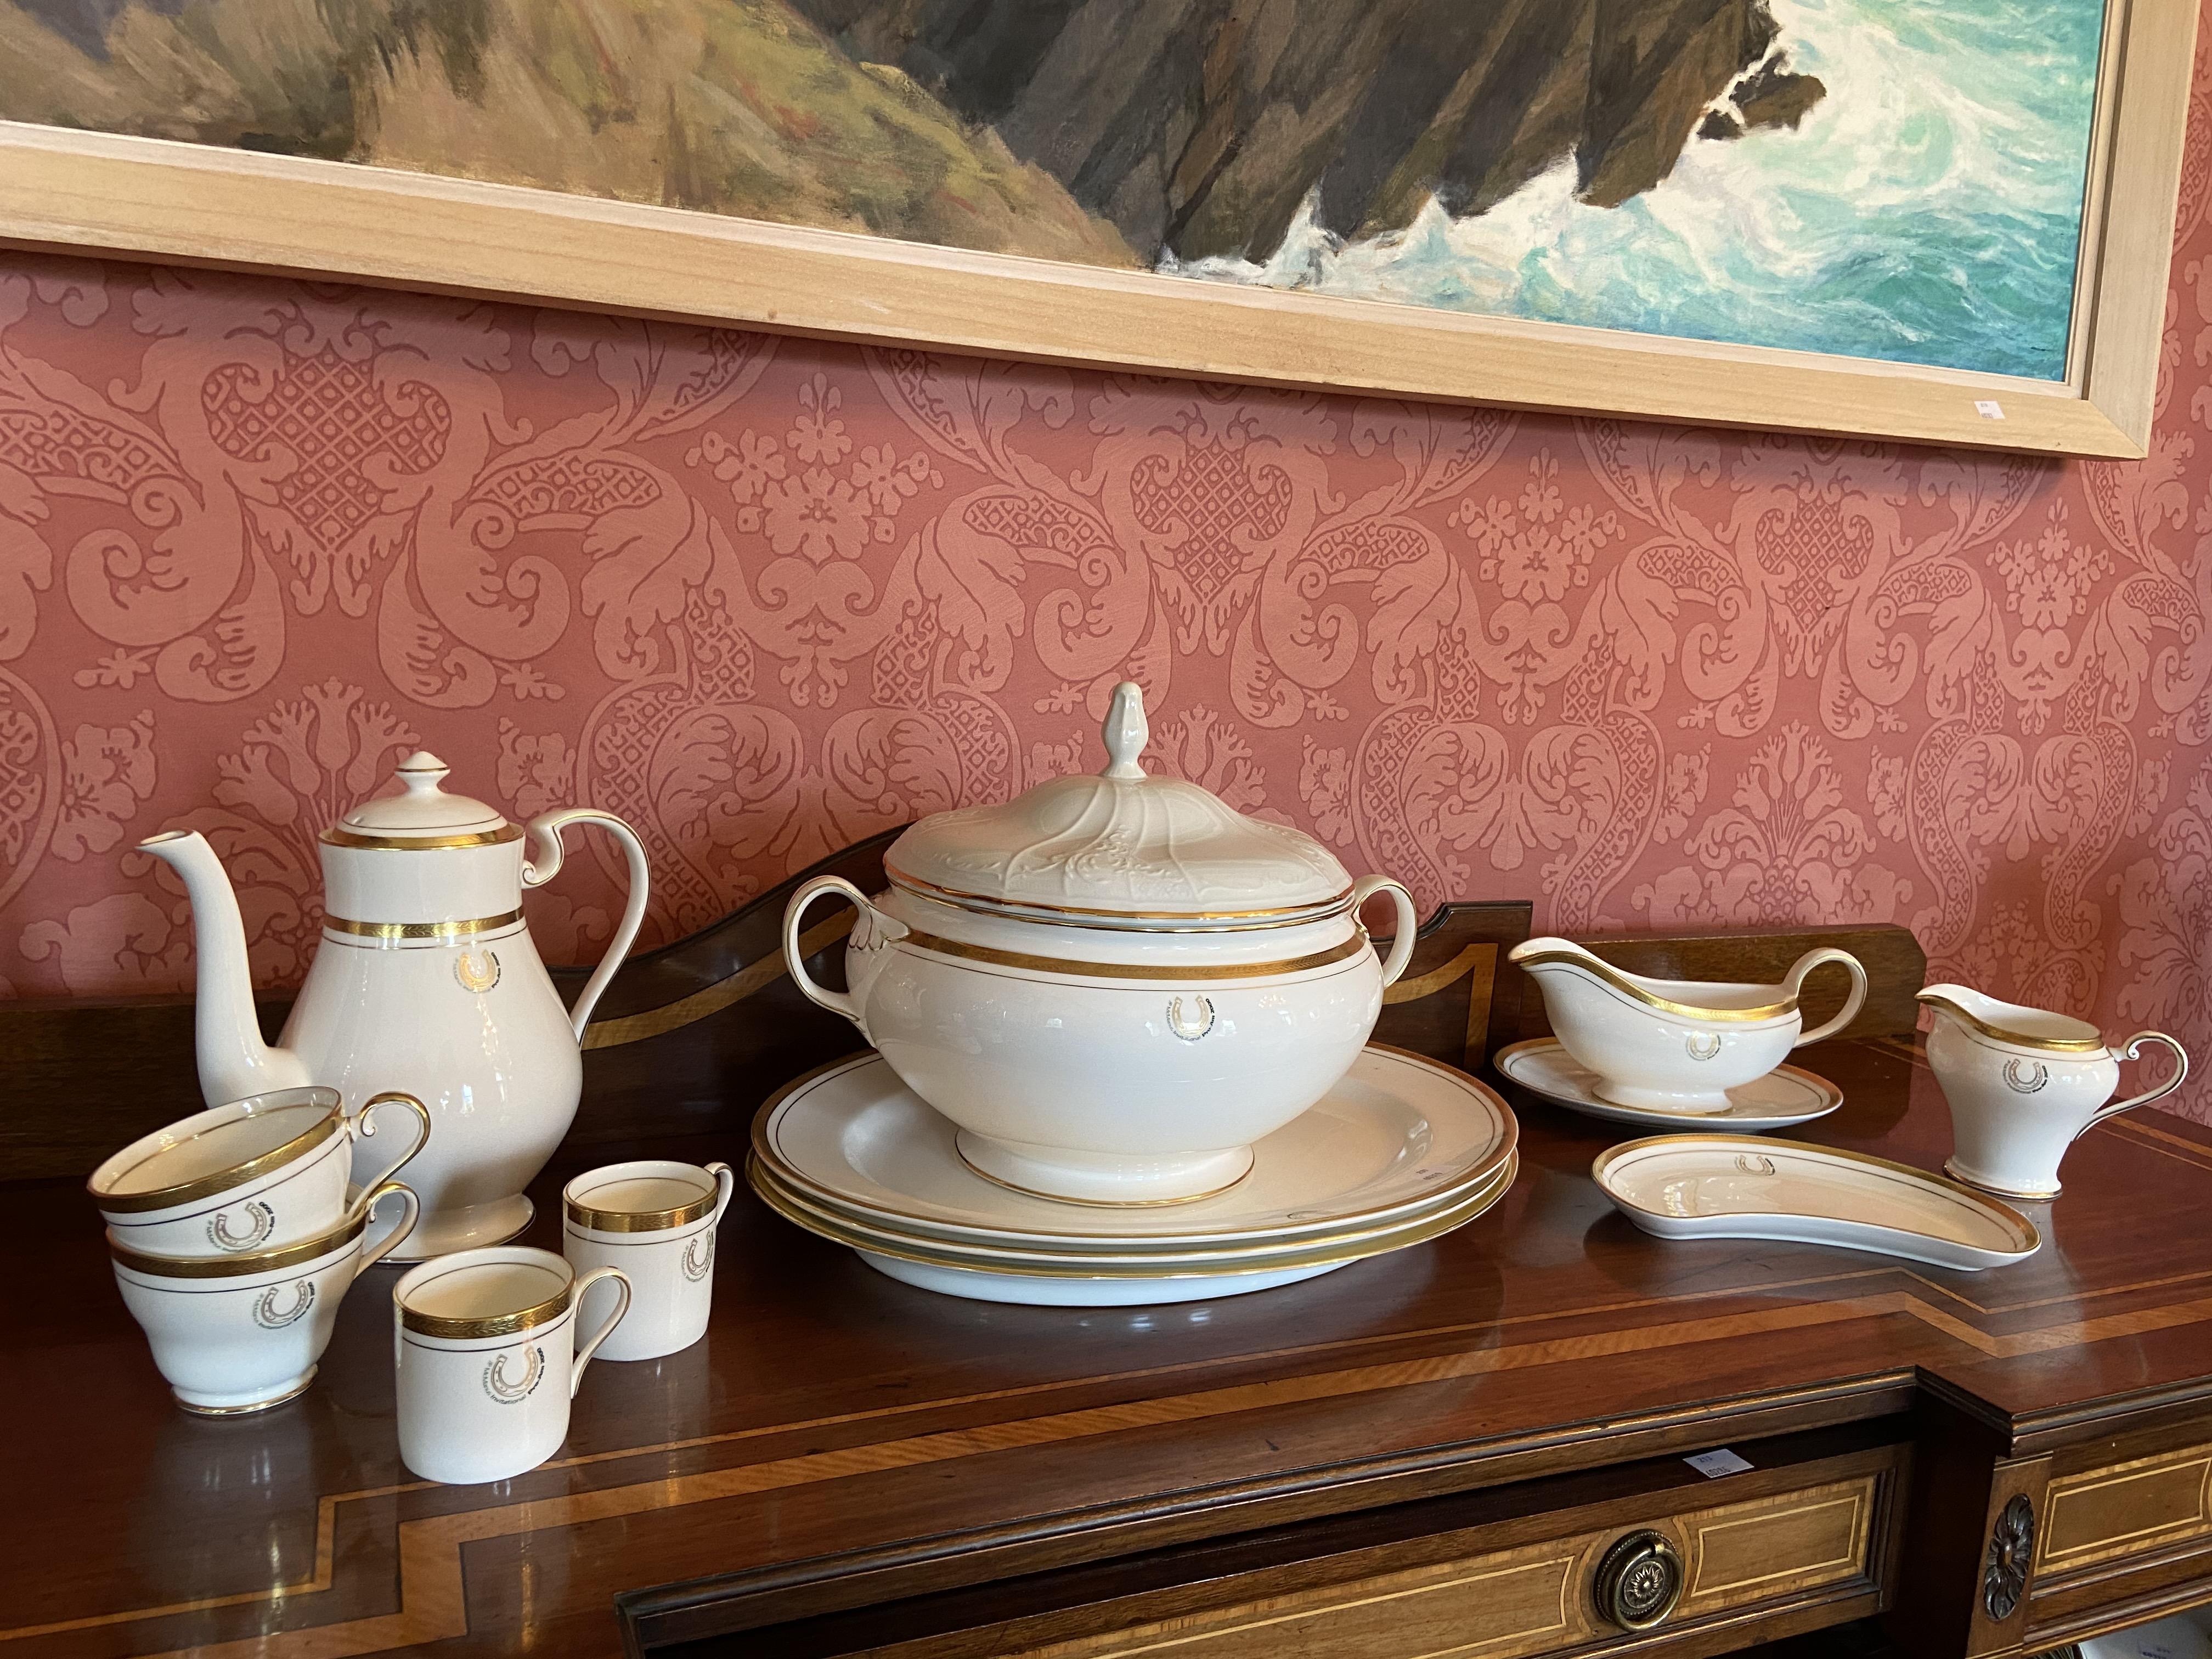 A fine Belleek Presentation Dinner, Tea, Coffee Service By Aynsley